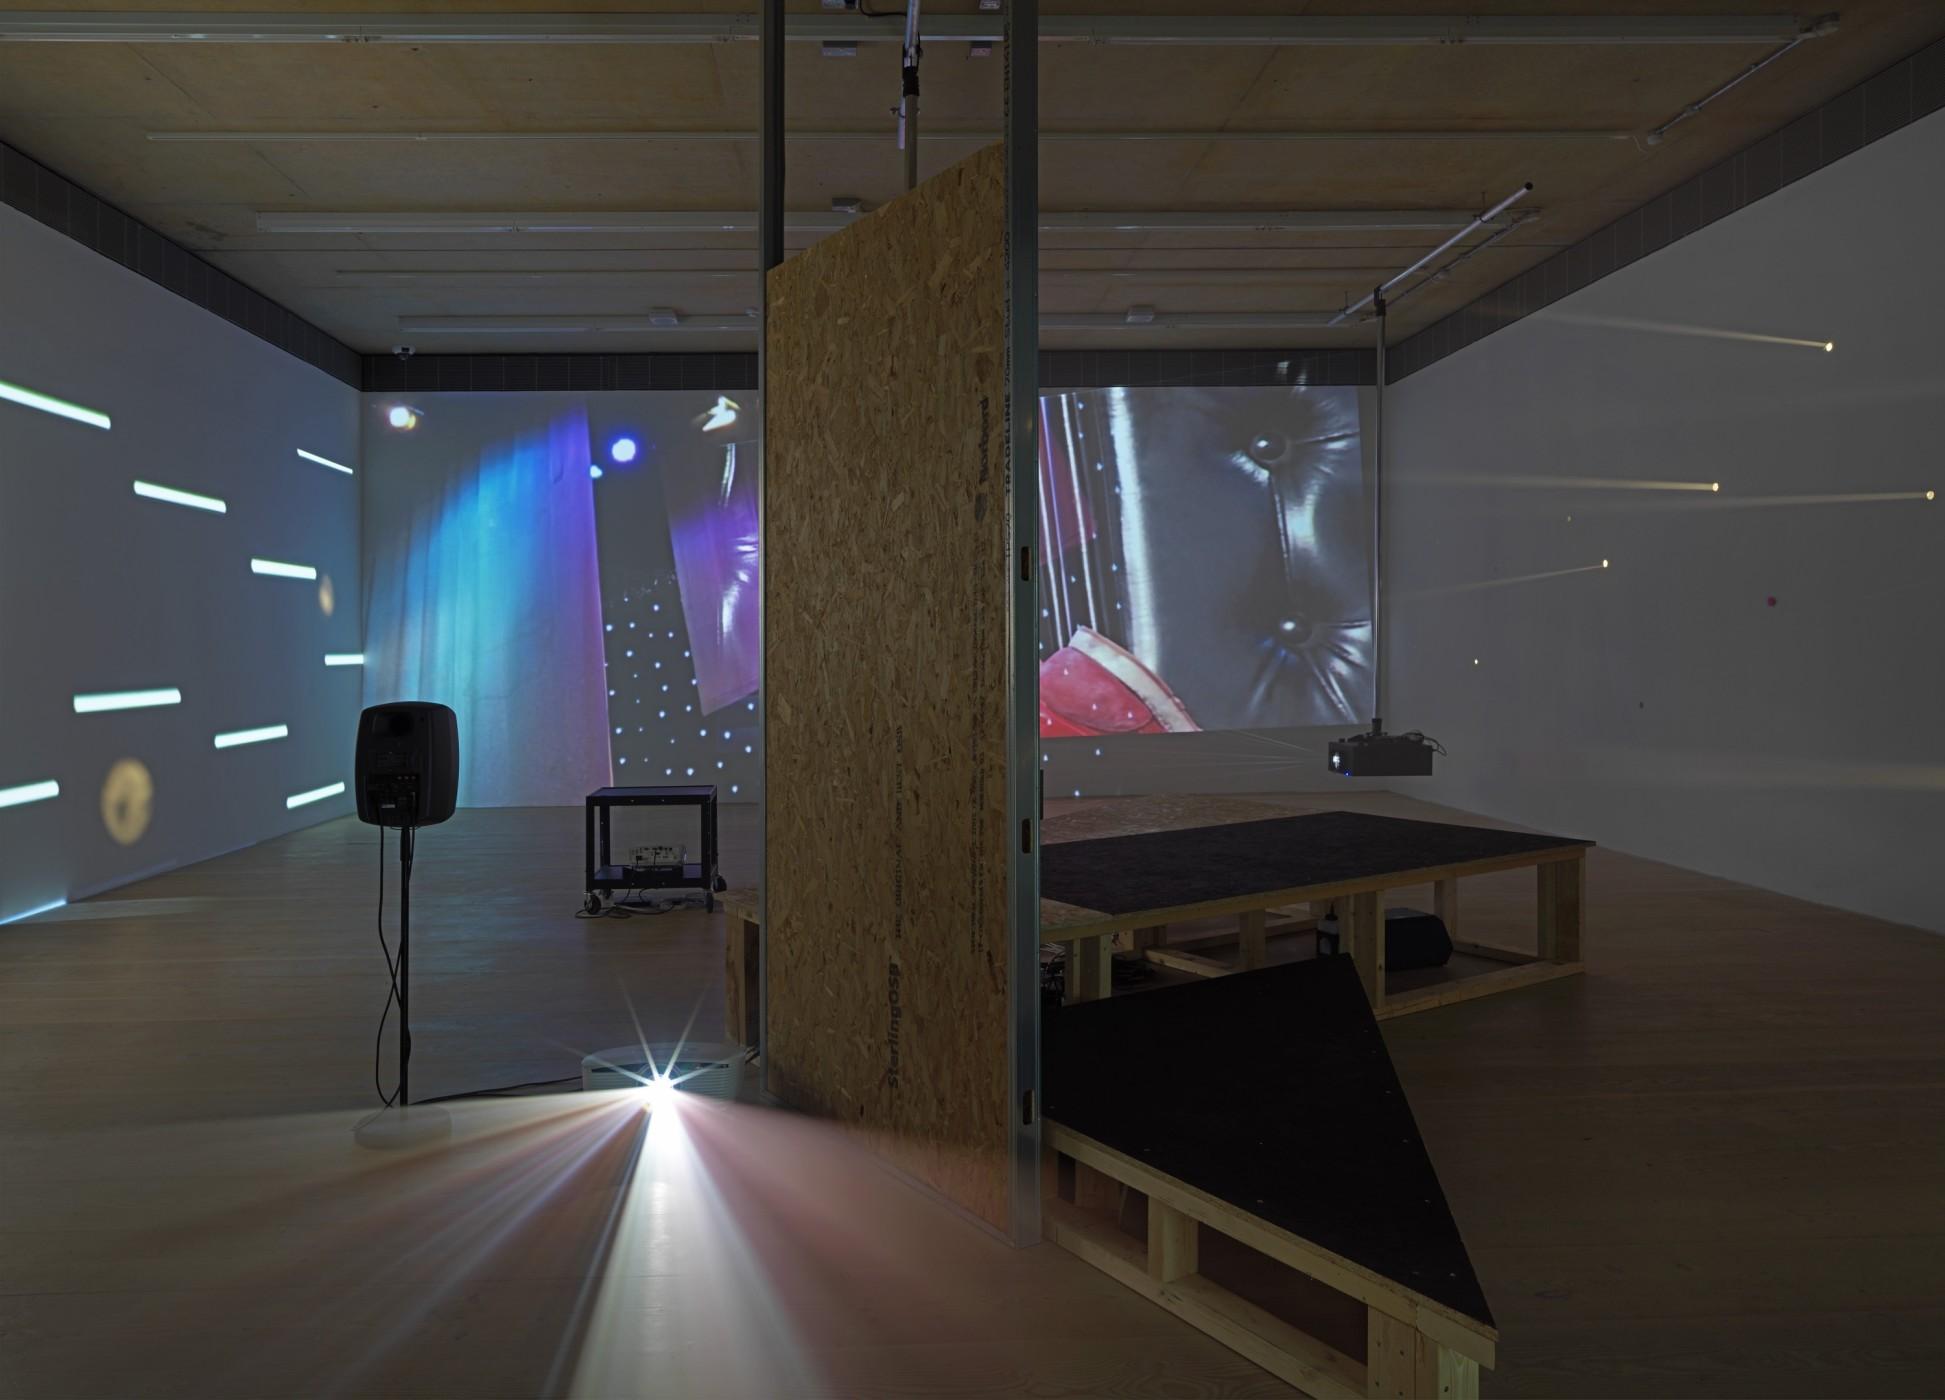 "<div class=""artwork_caption""><p>Installation View, 2017<br />Photo by Marcus J Leith</p></div>"